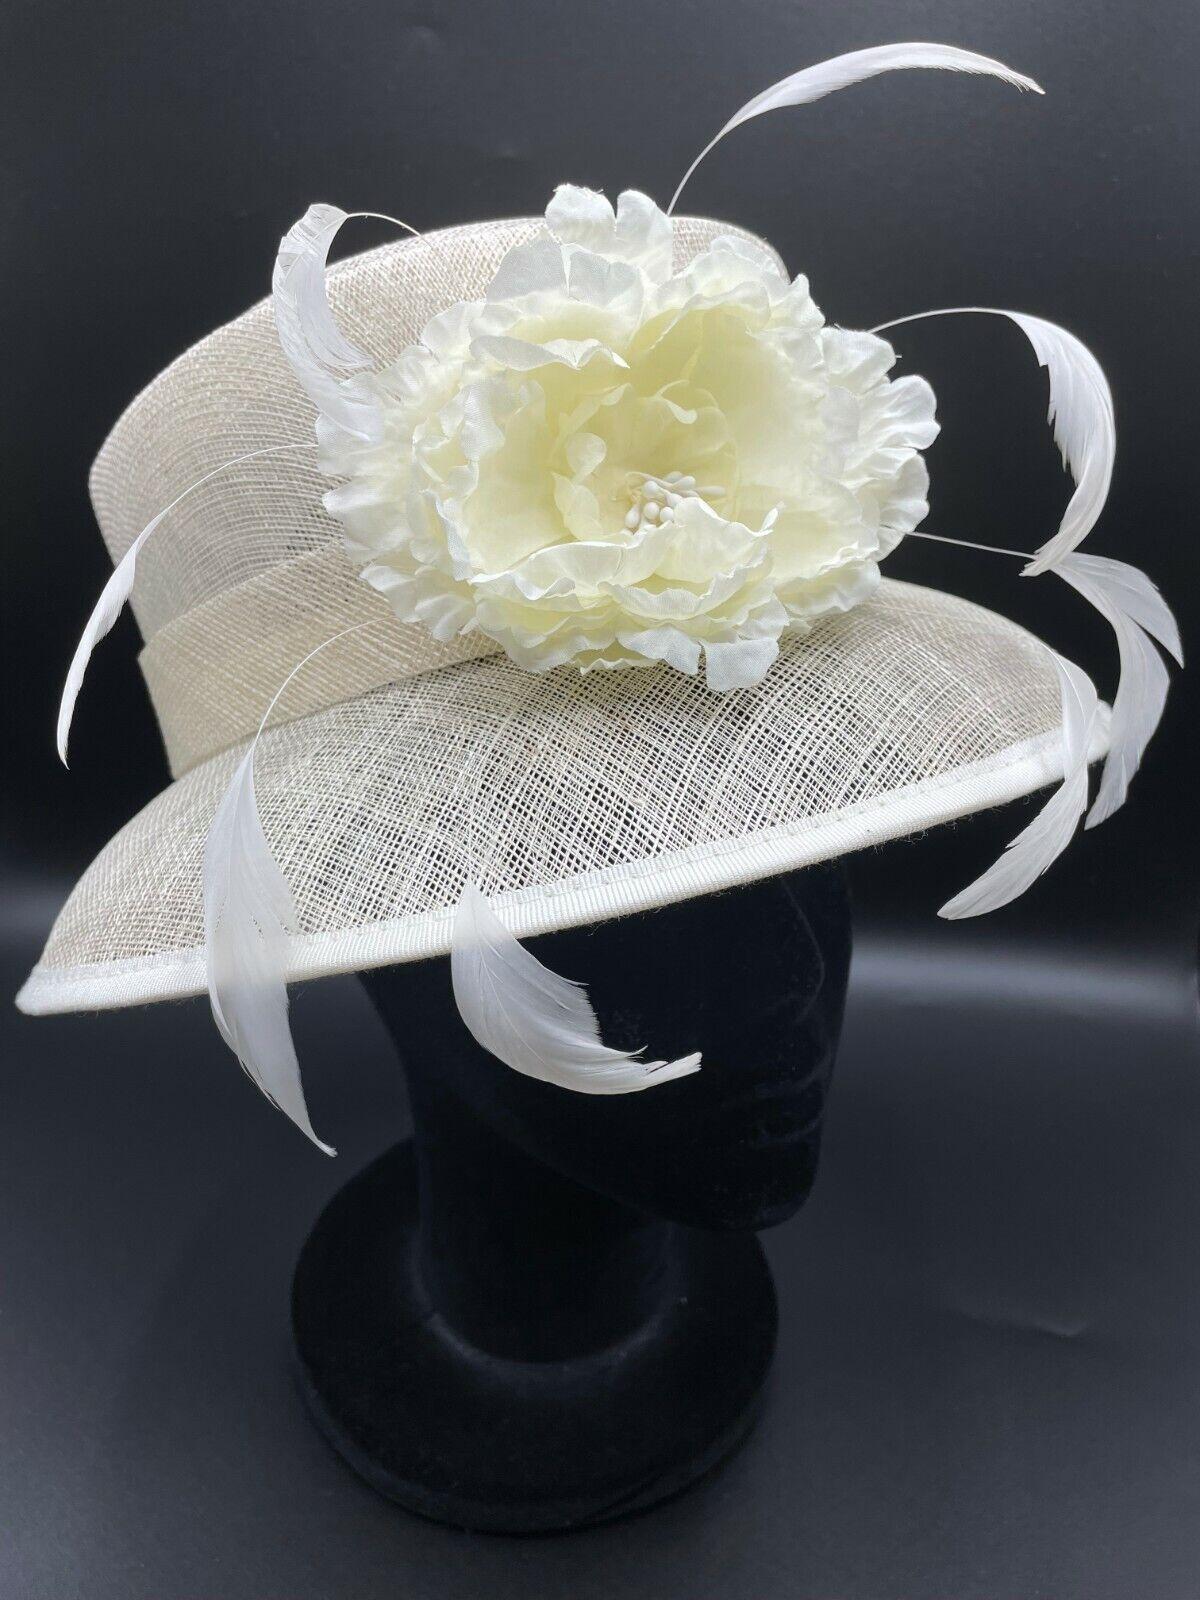 * Ladies cream formal wedding mother of groom full hat flower bridal ascot posh